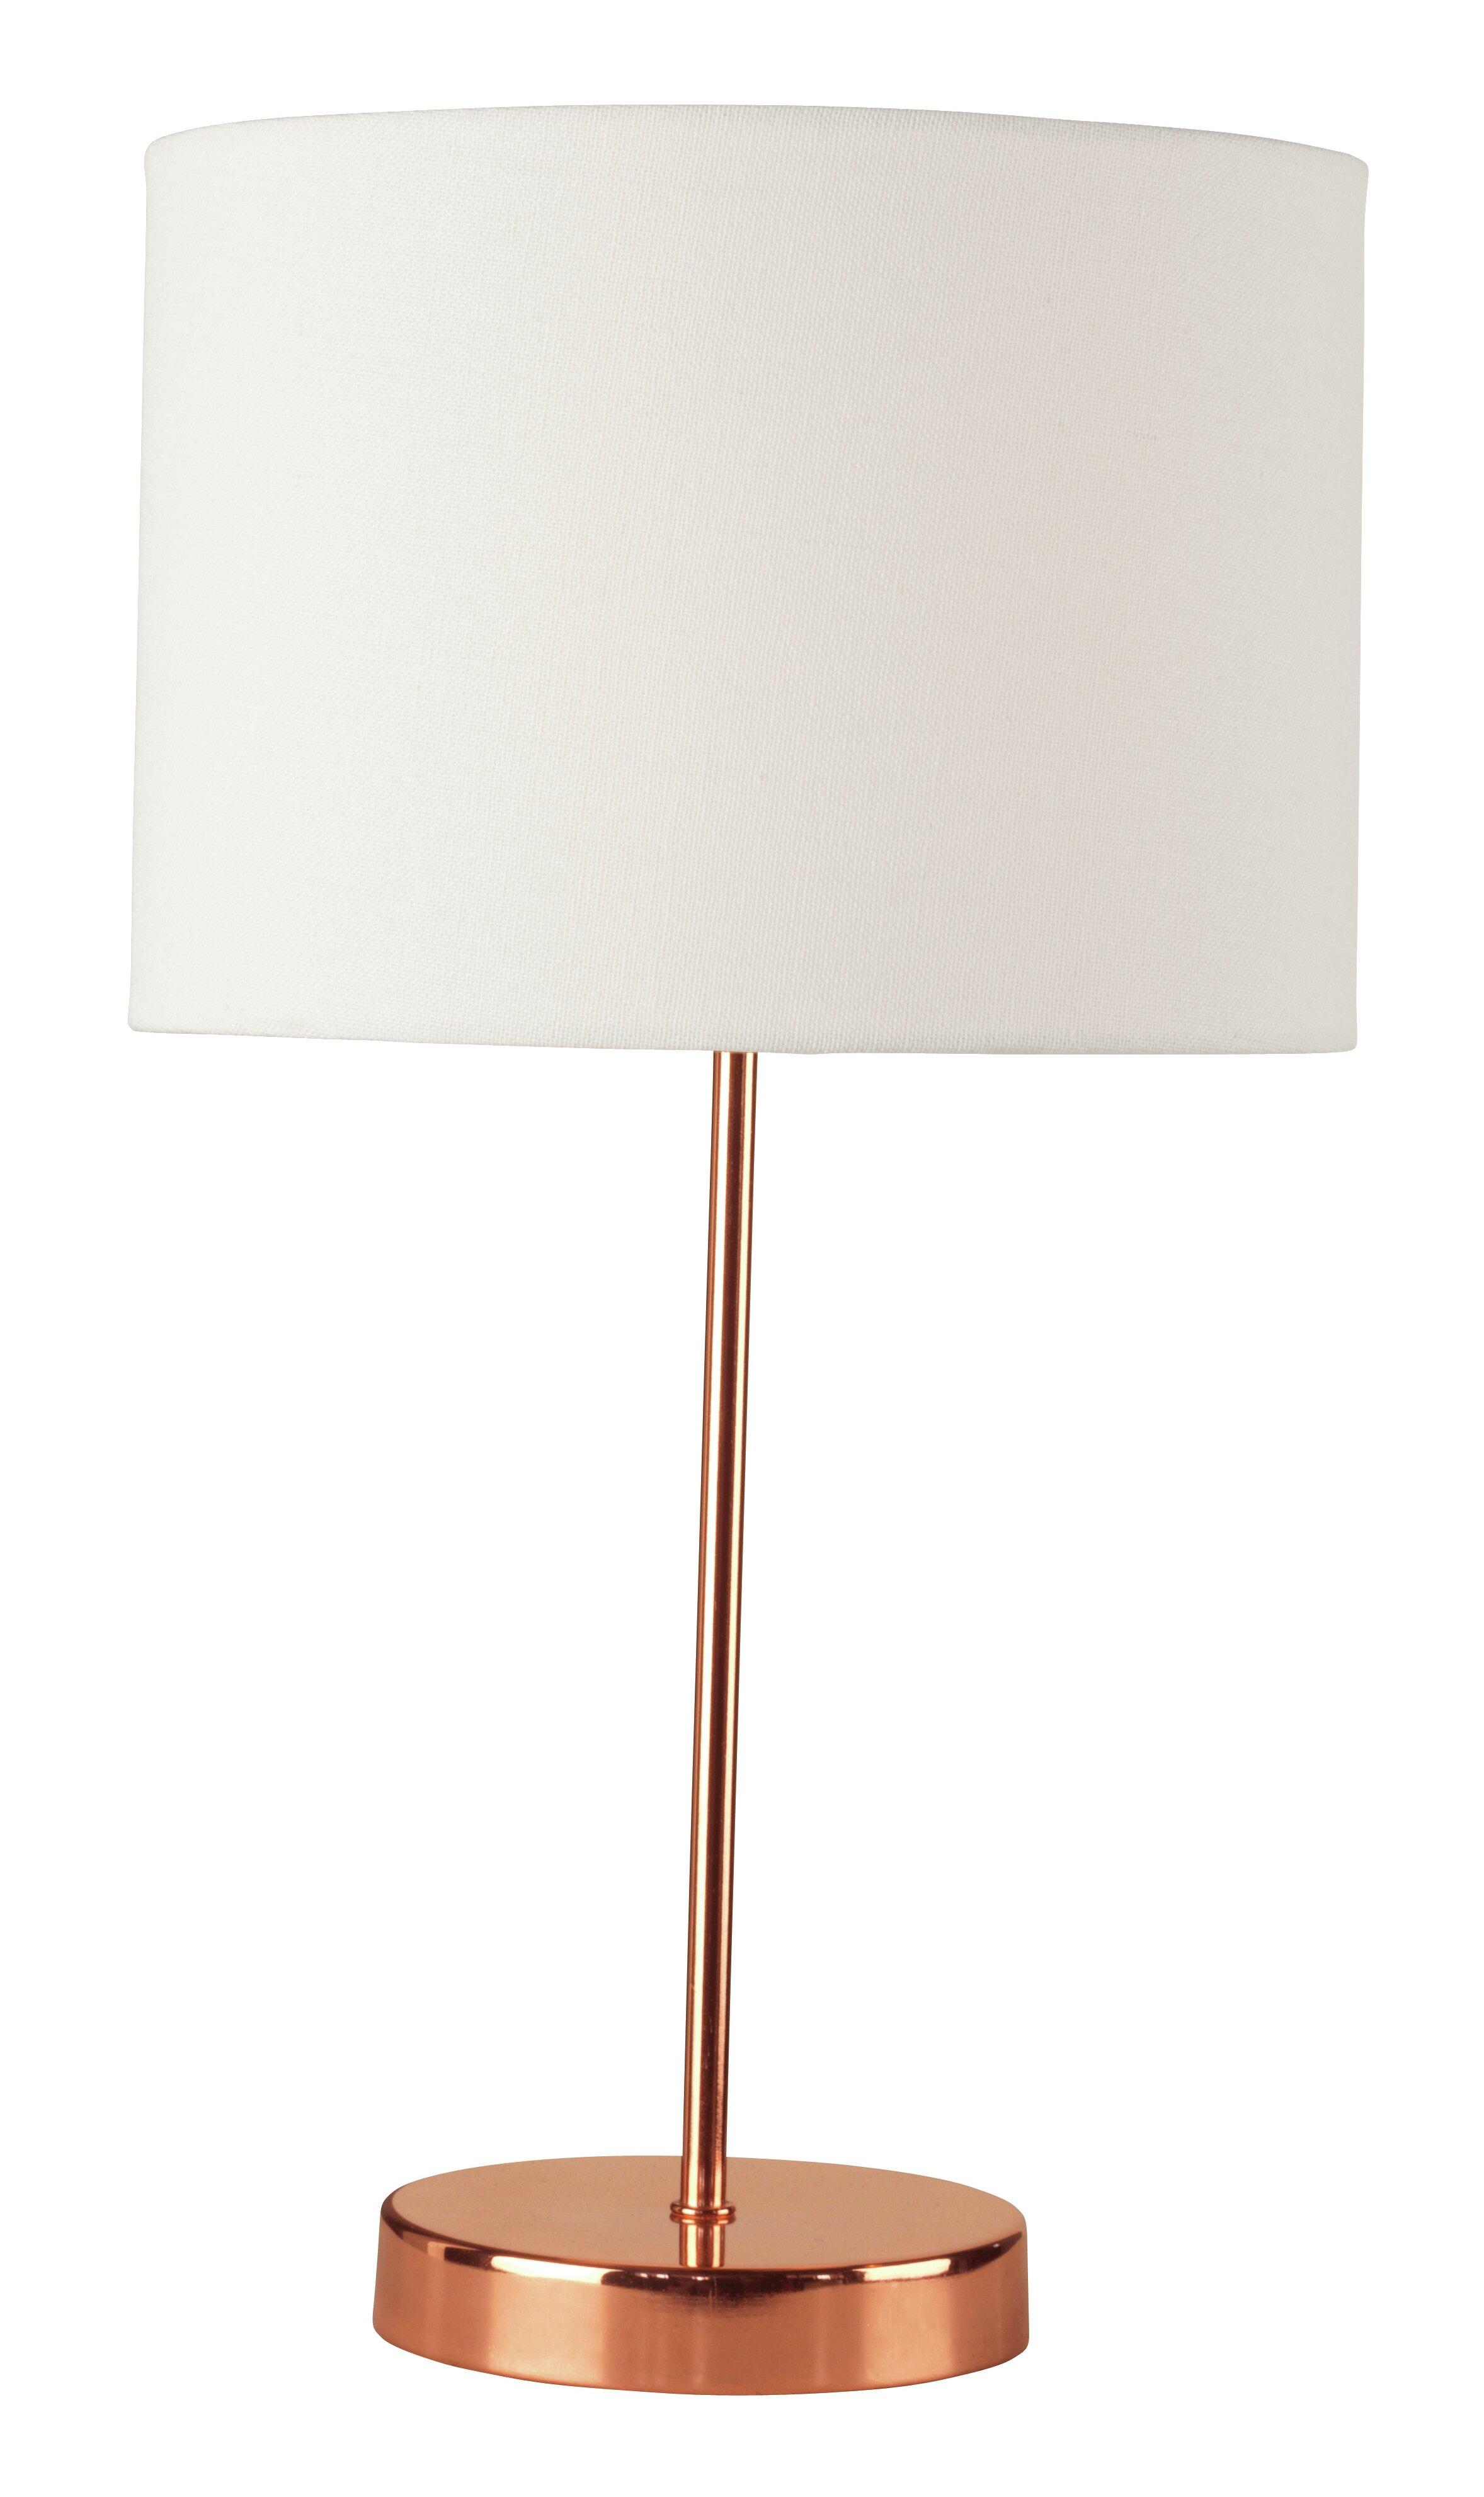 7e7ae692ca3f The Lighting & Interiors Group Islington 47cm Table Lamp   Wayfair.co.uk